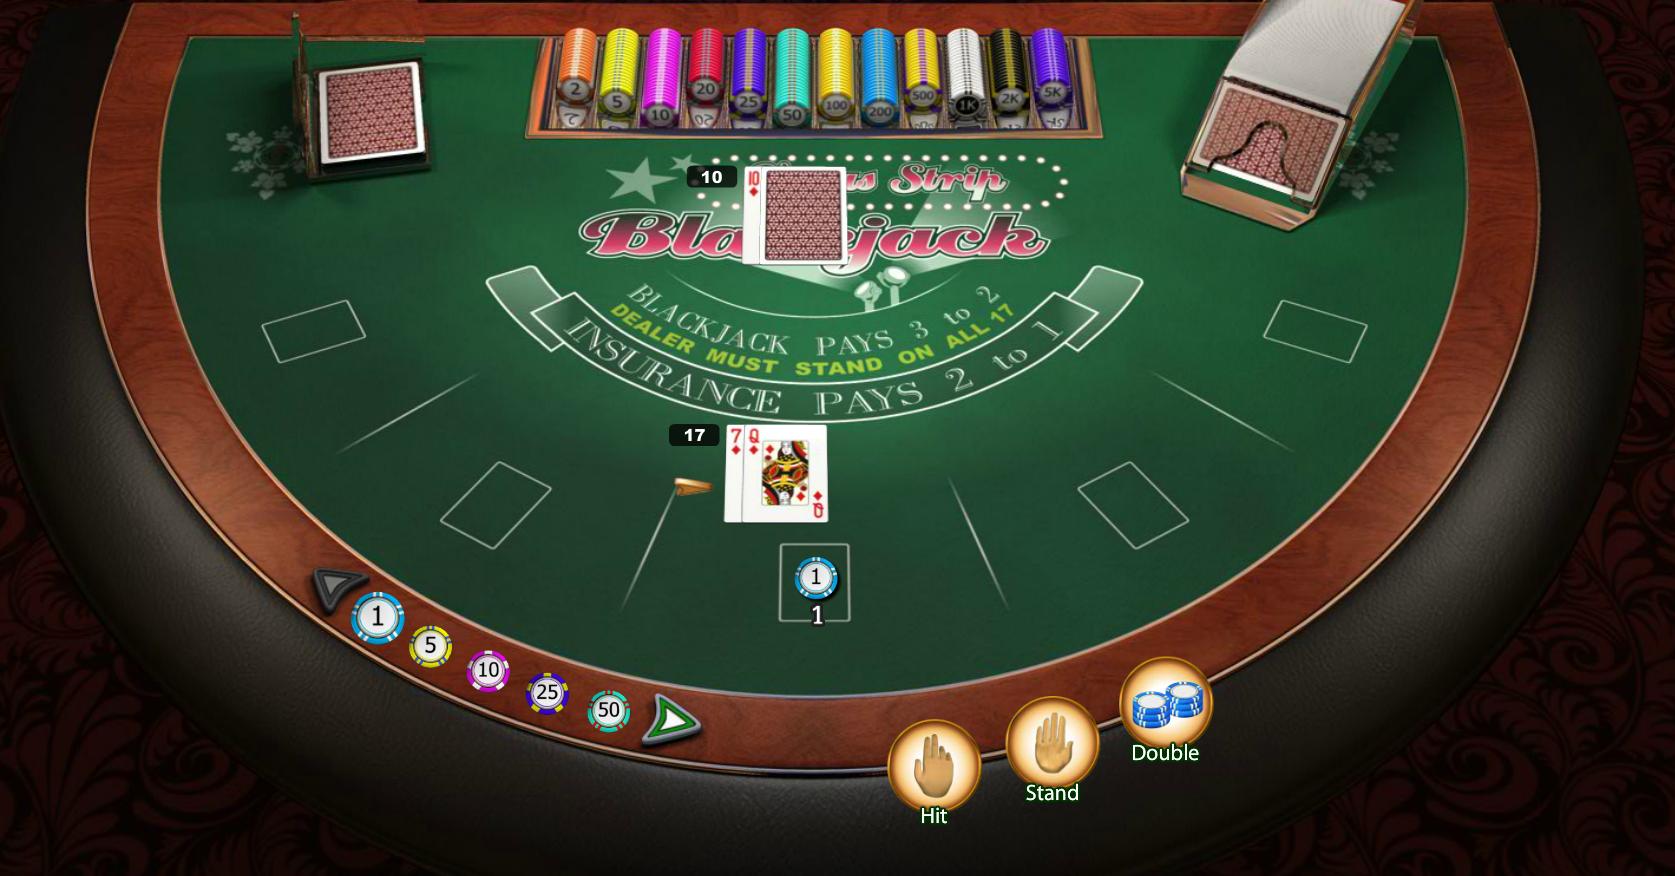 Kings club poker